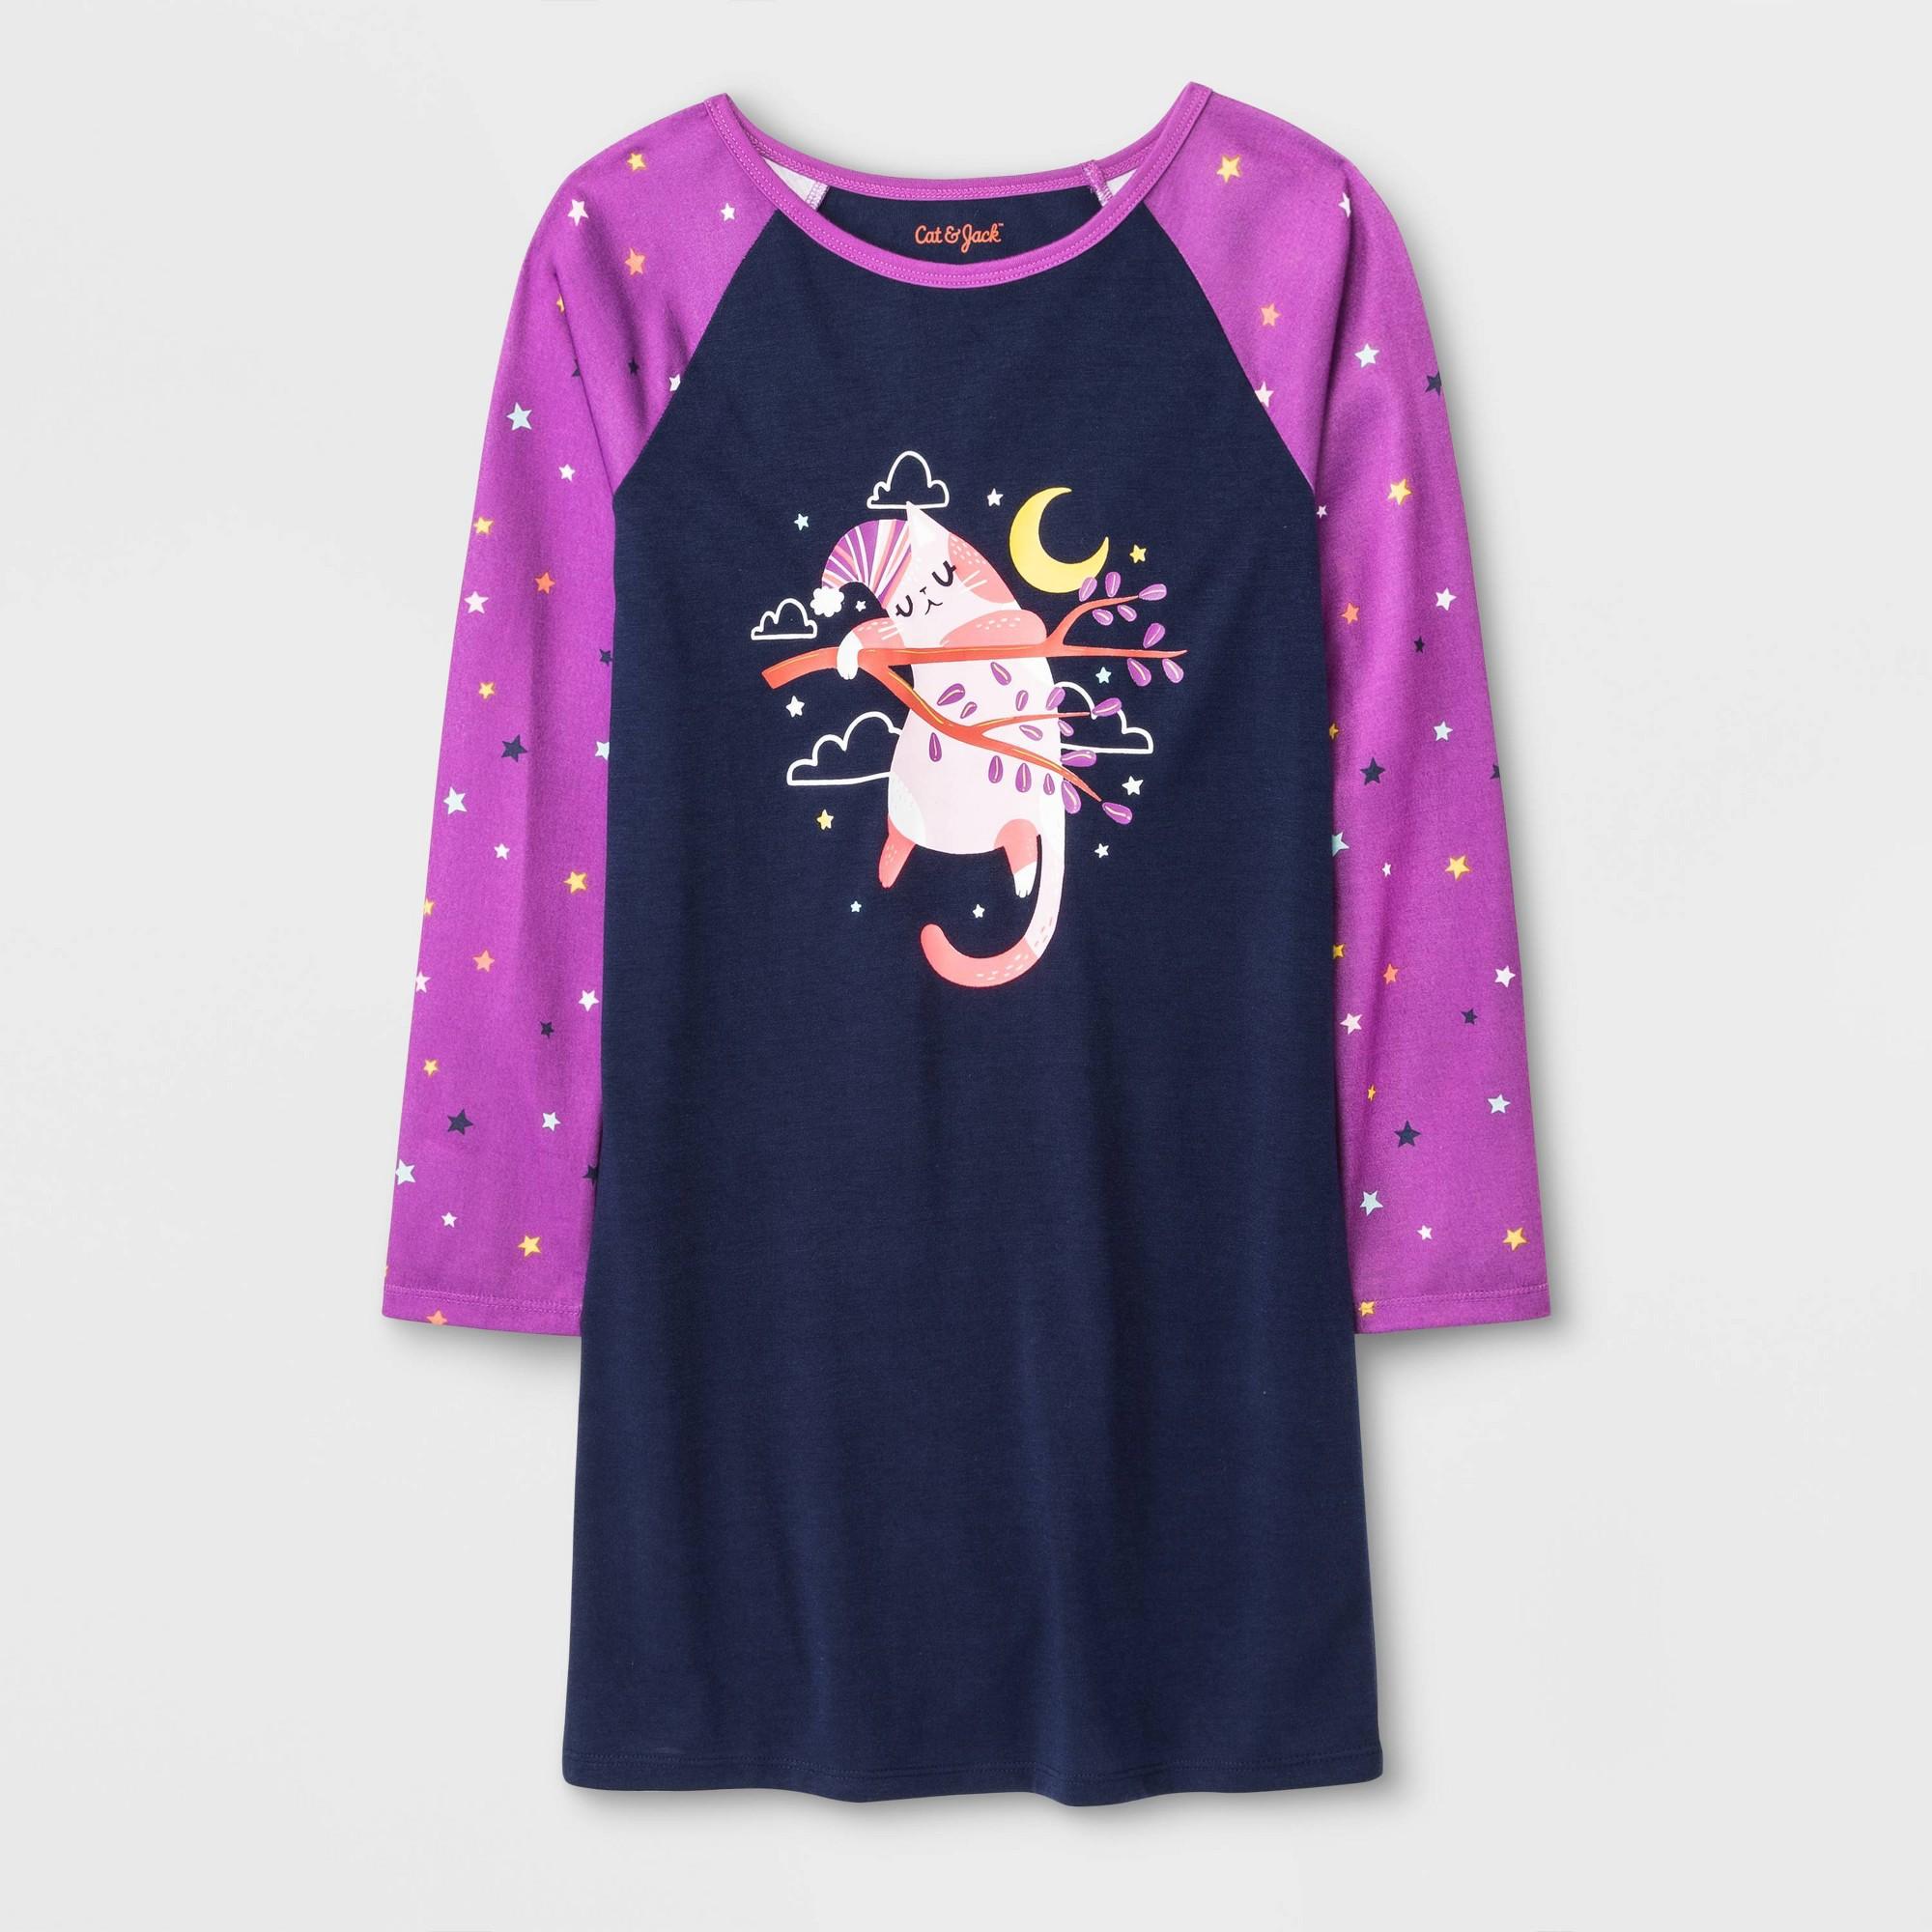 Girls' One Piece Pajamas - Cat & Jack Blue XL, Girl's